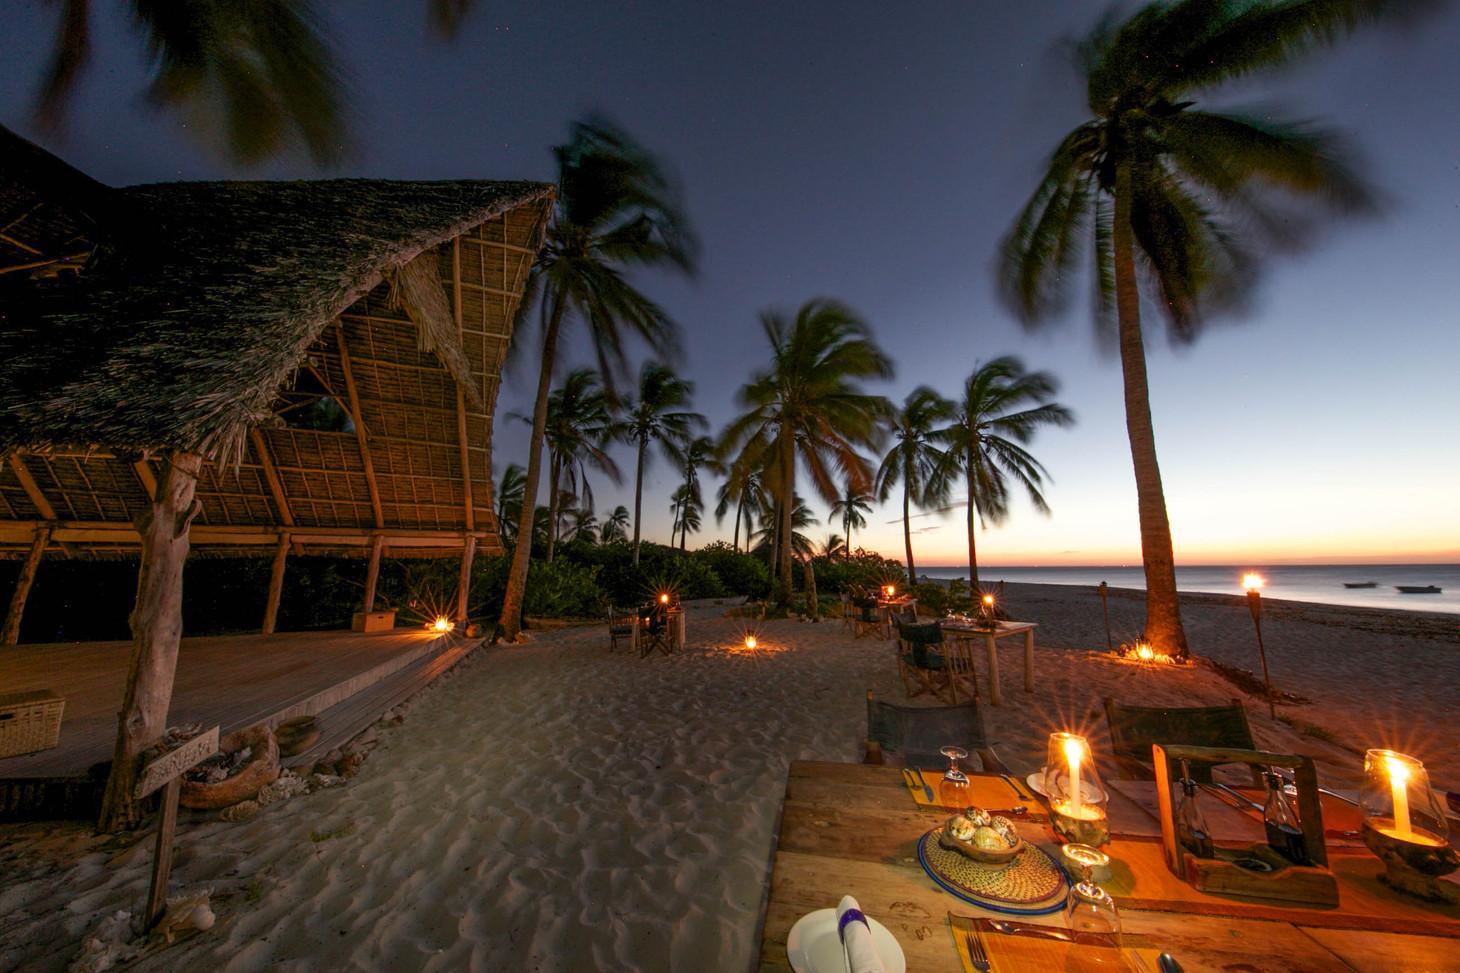 Tanzania Fanjove Island Dining area